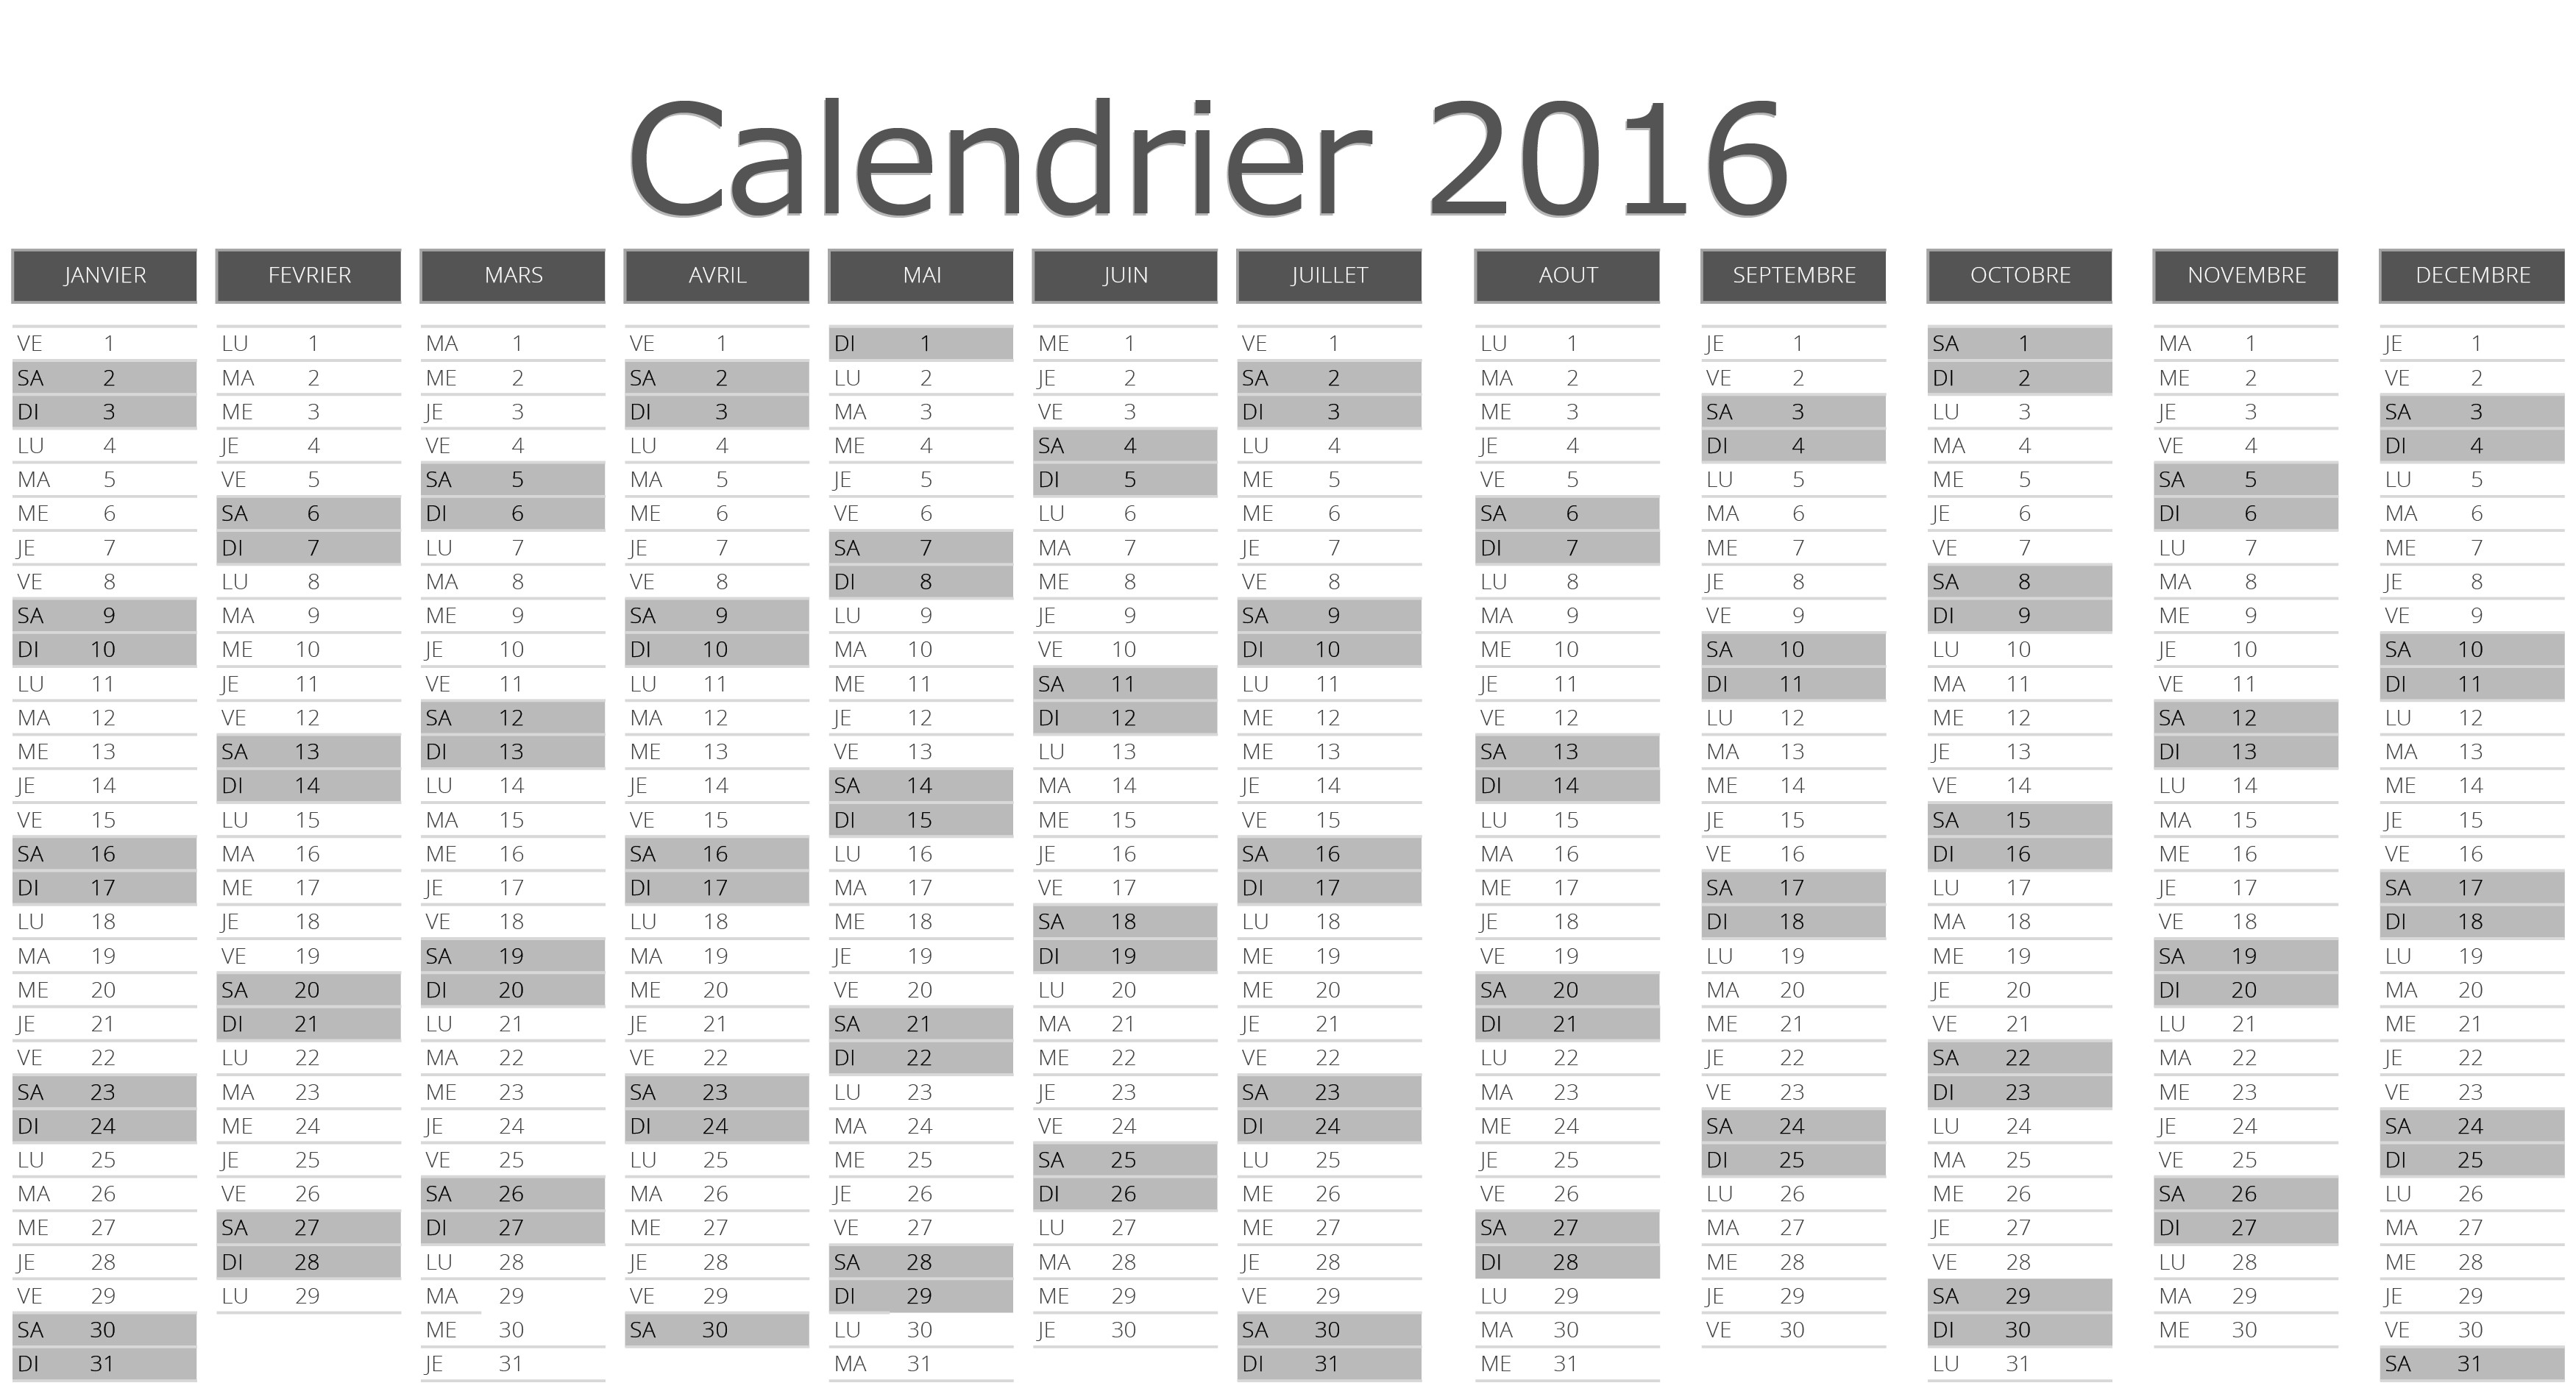 Calendario Mayo 2019 Para Imprimir Más Recientes 2019 2018 Calendar Printable with Holidays List Kalender Kalendar